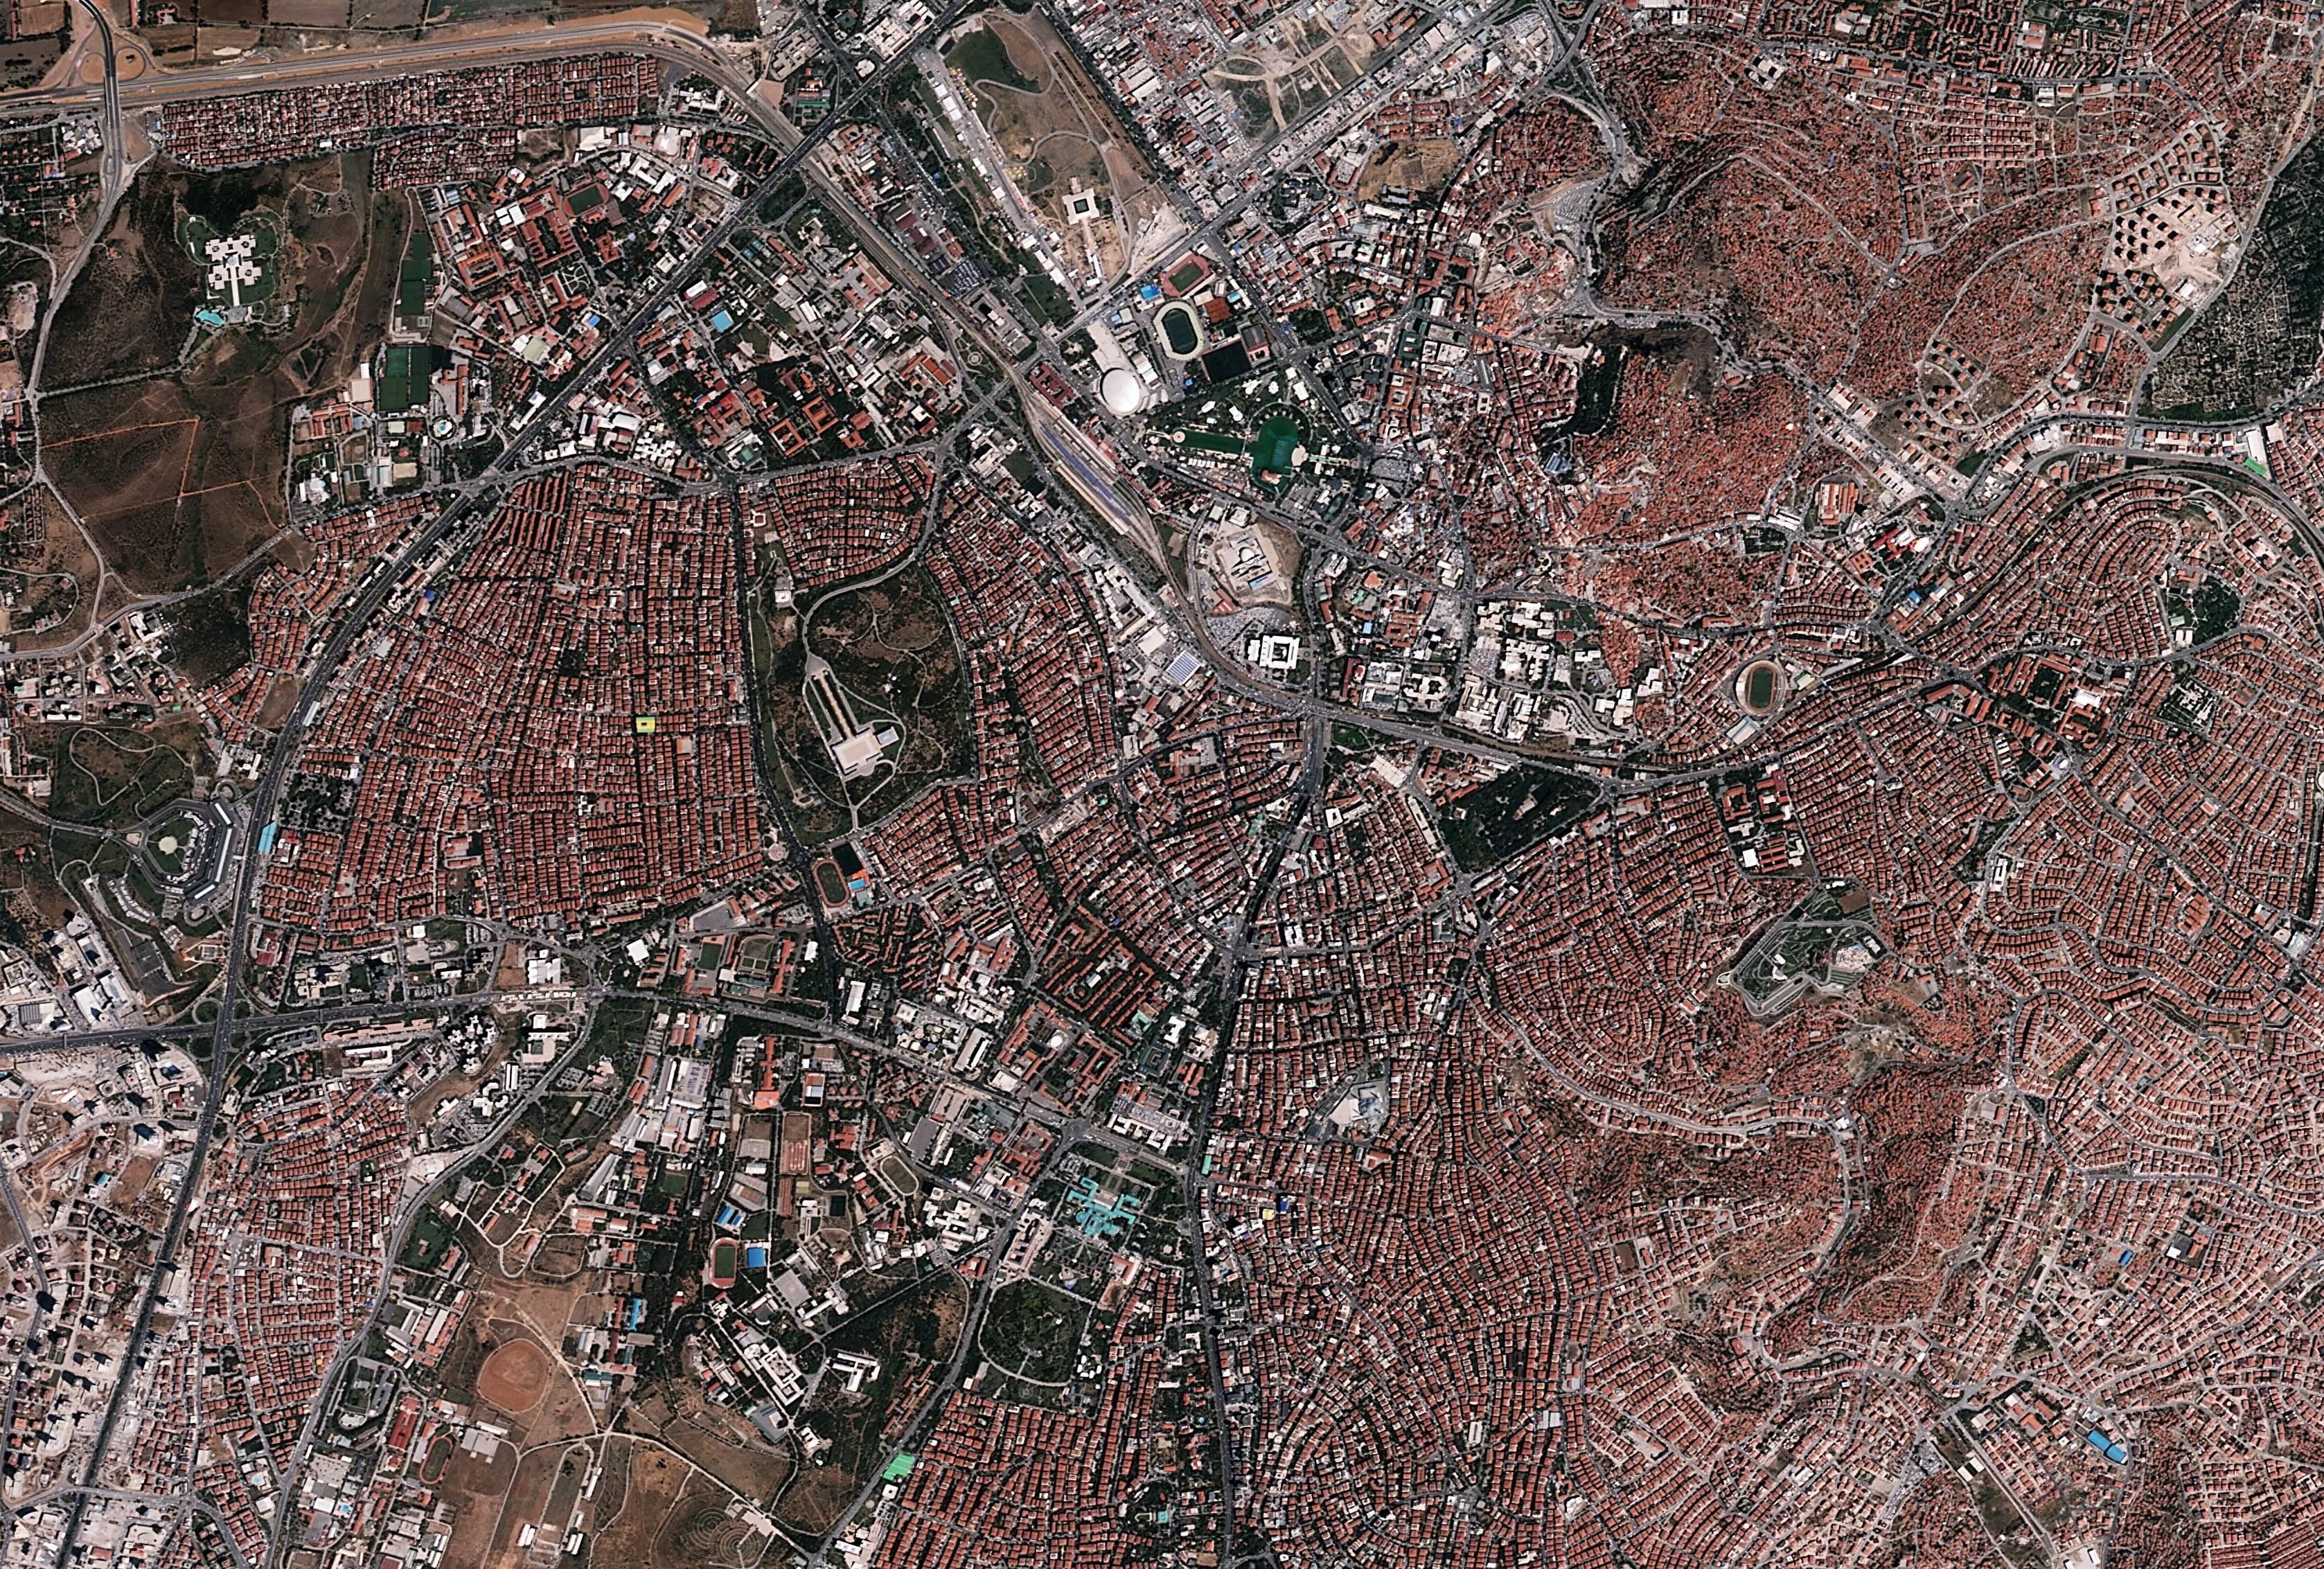 Göktürk-2 Ankara 23 Haziran 2013